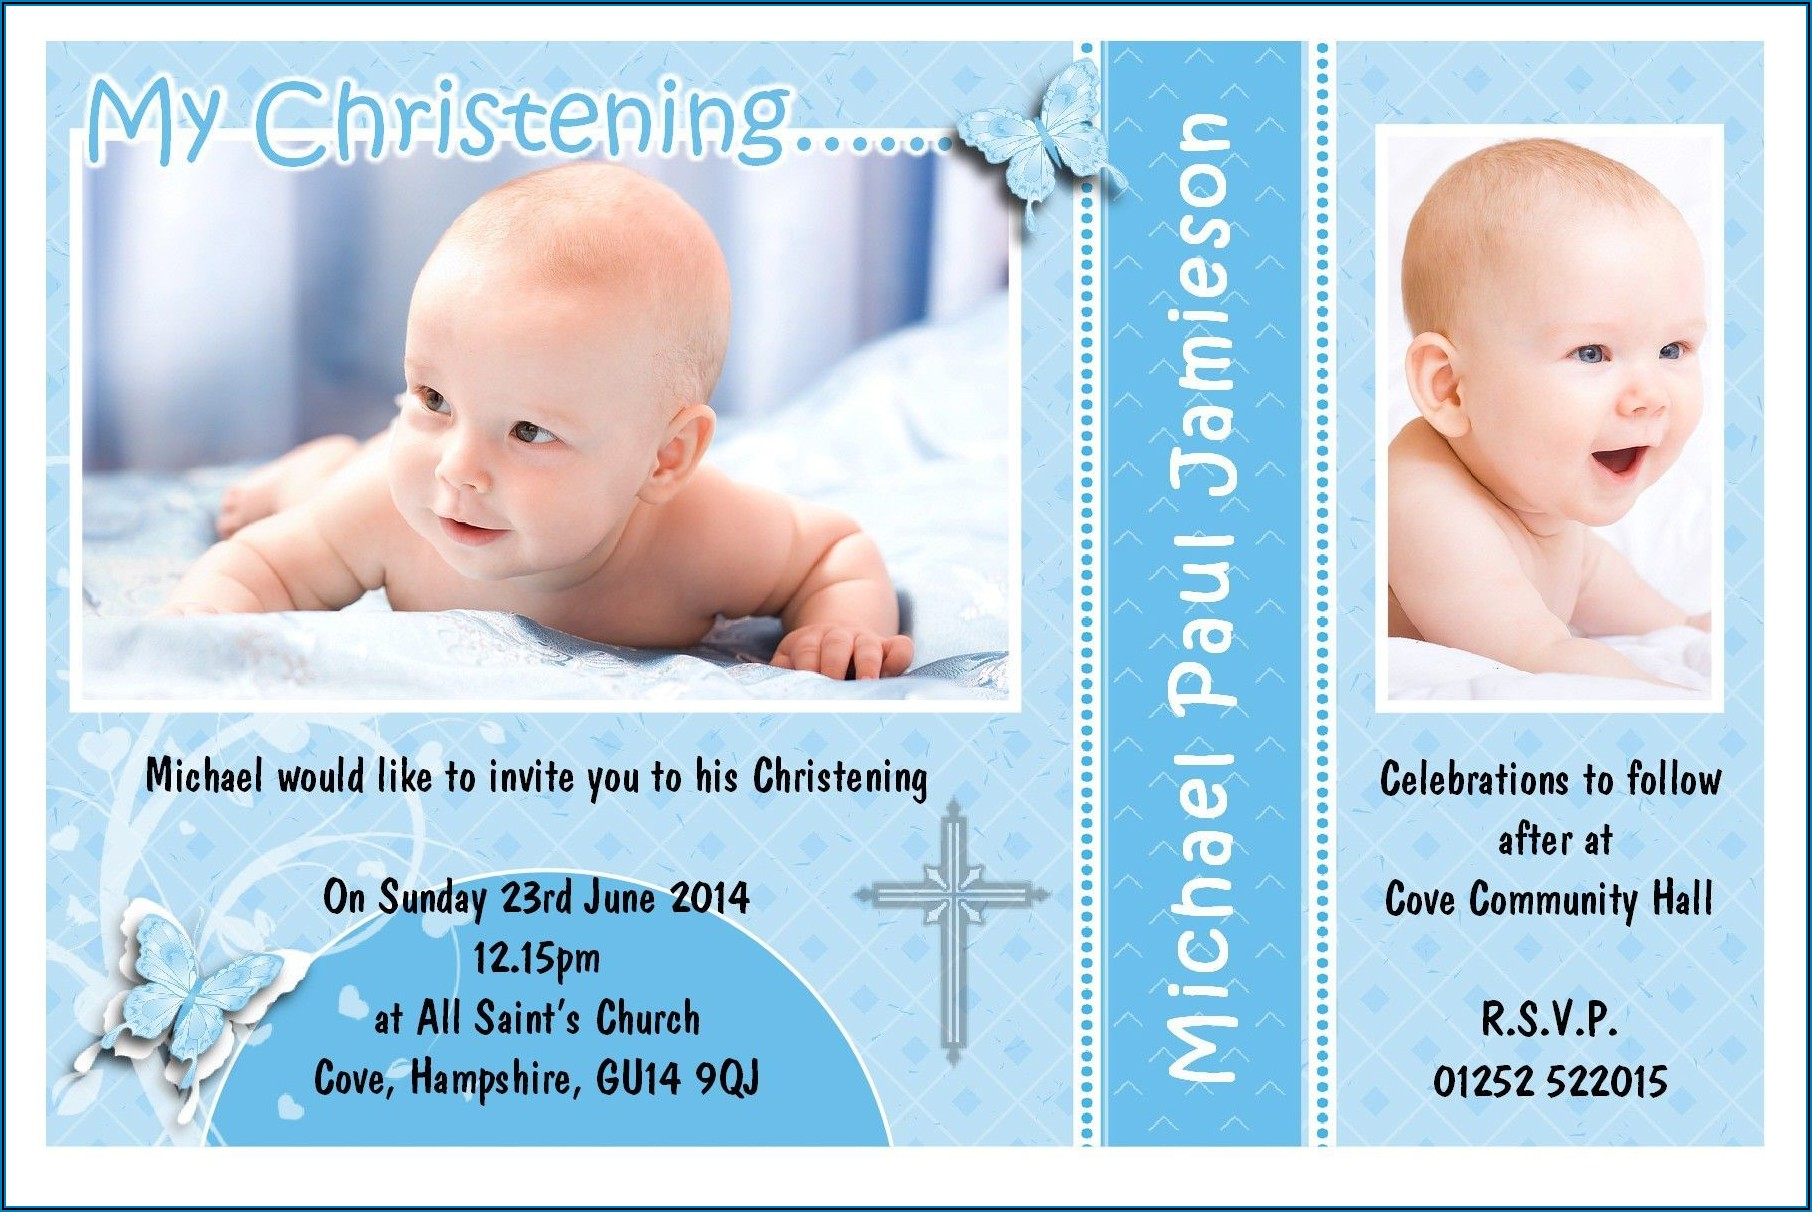 Christening Invitation For Baby Boy Pinterest